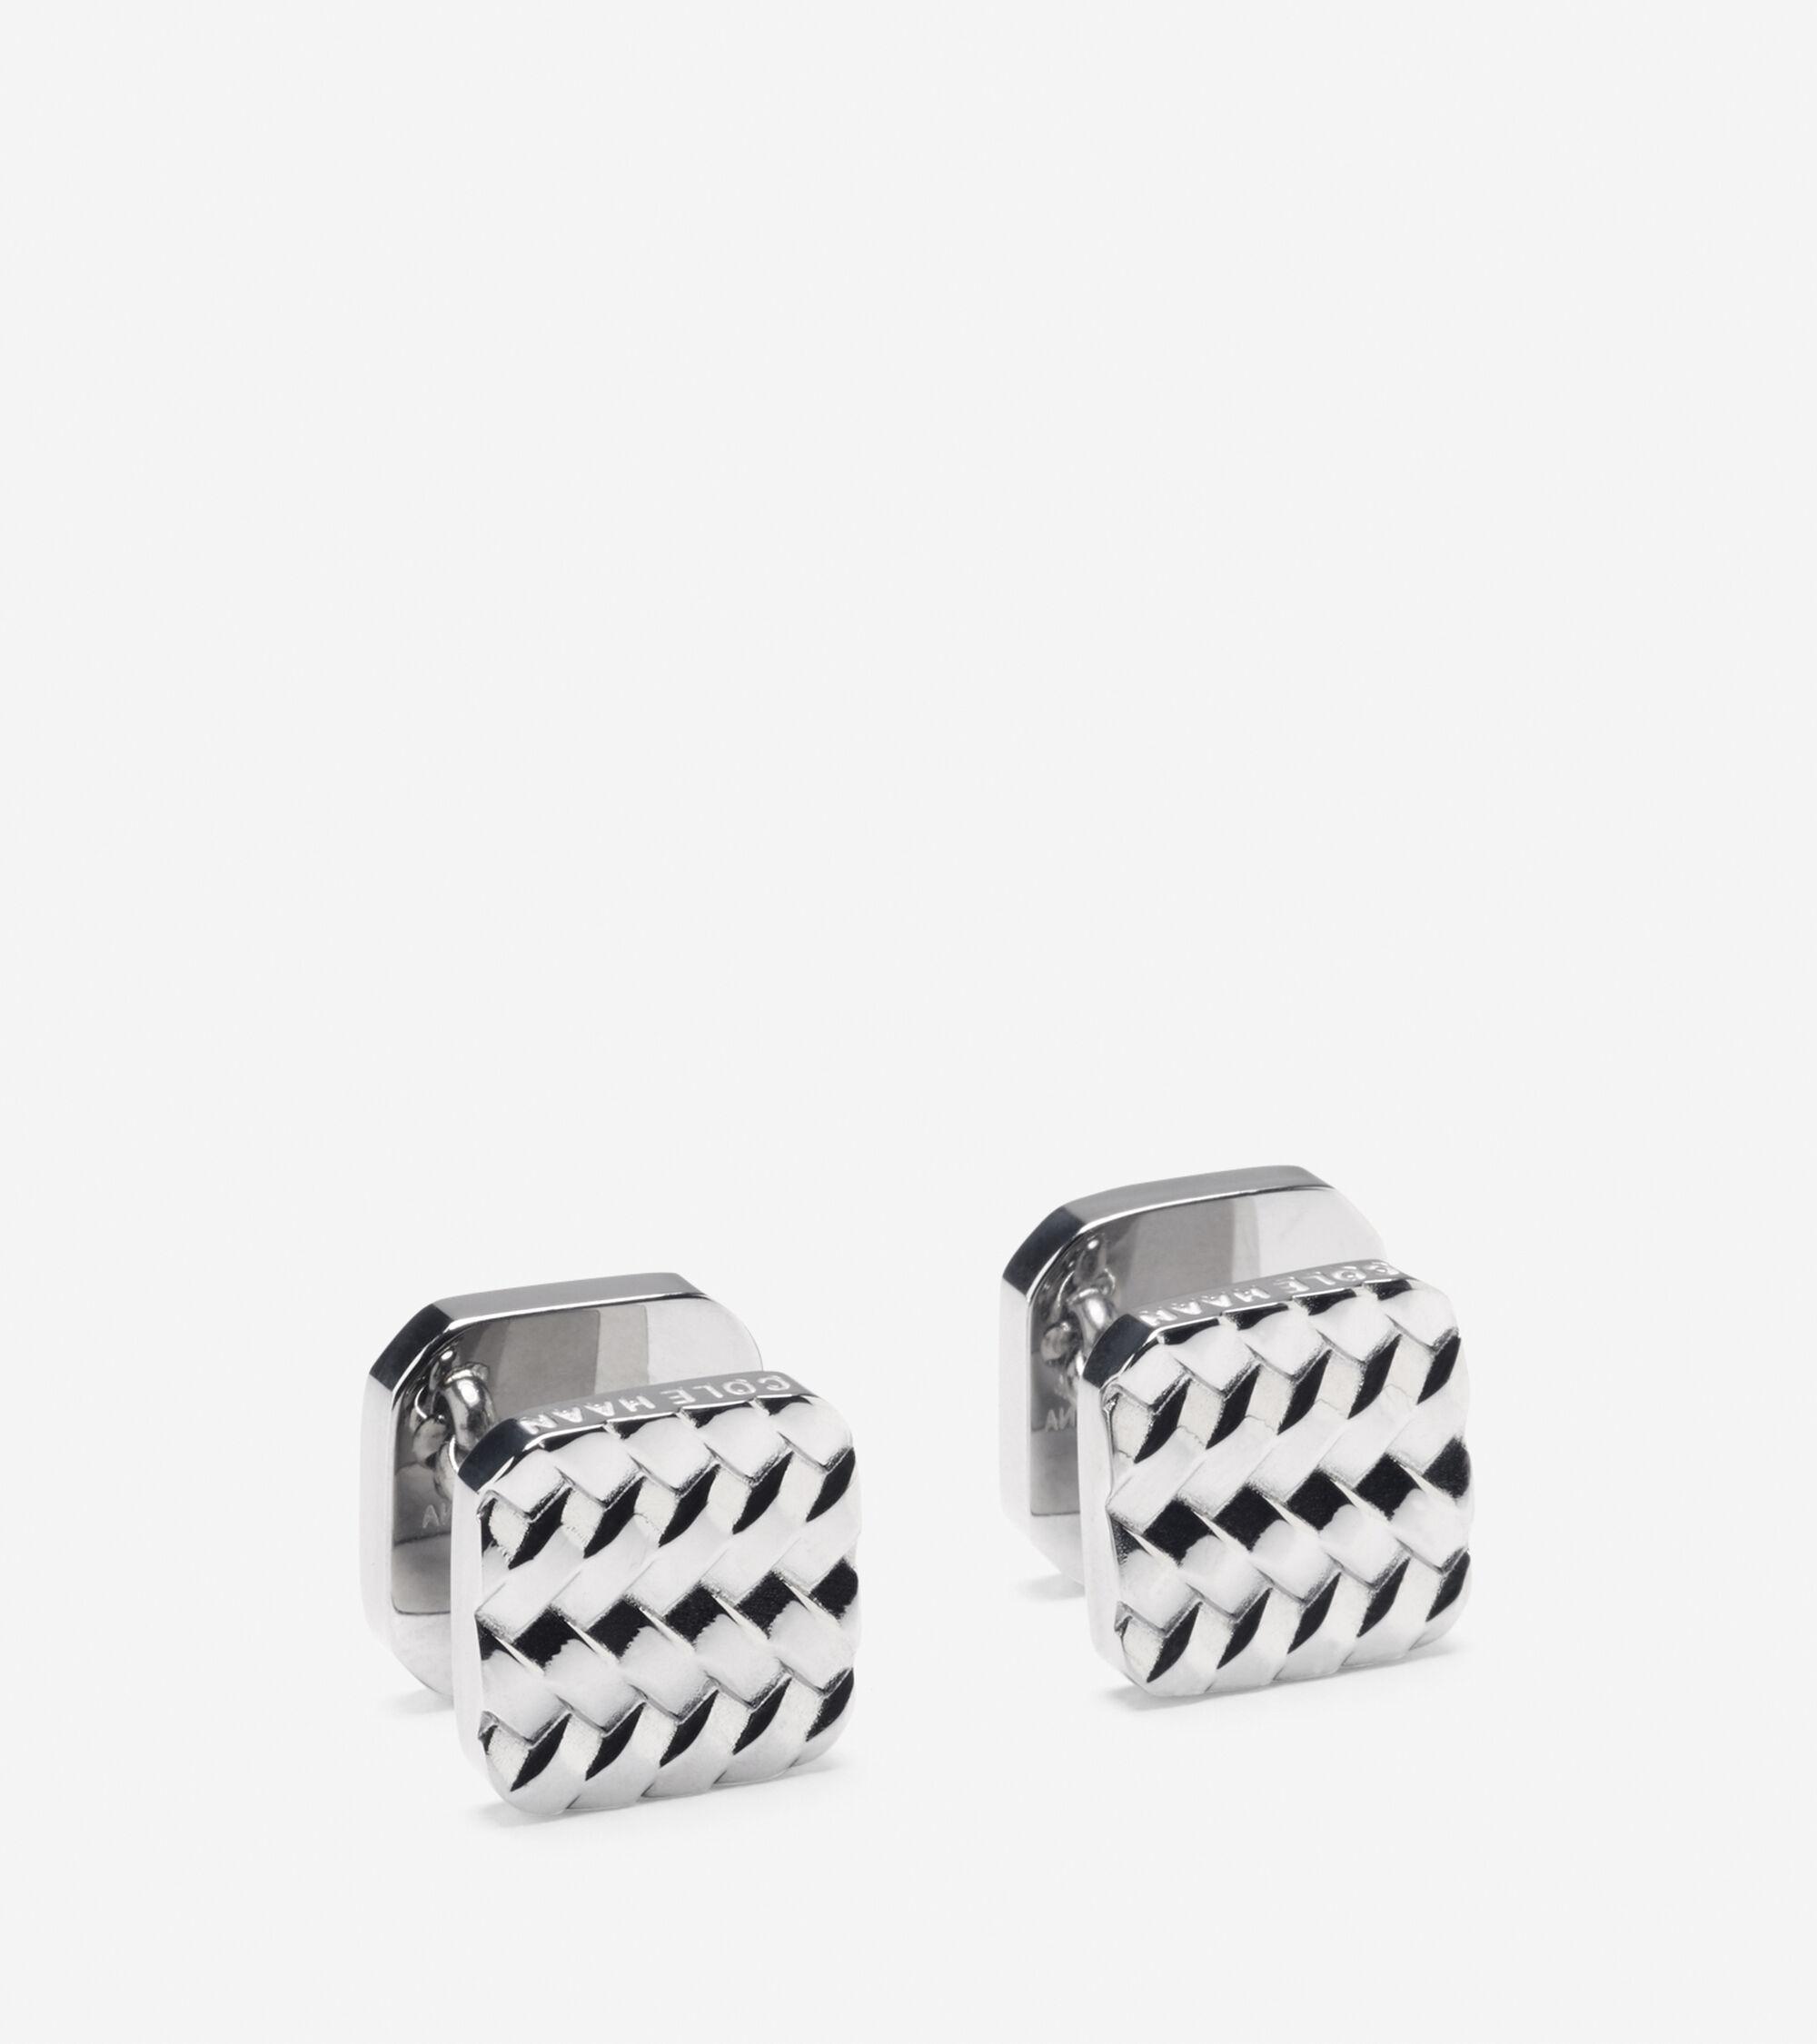 Accessories > Metal Basket Weave Cuff Links